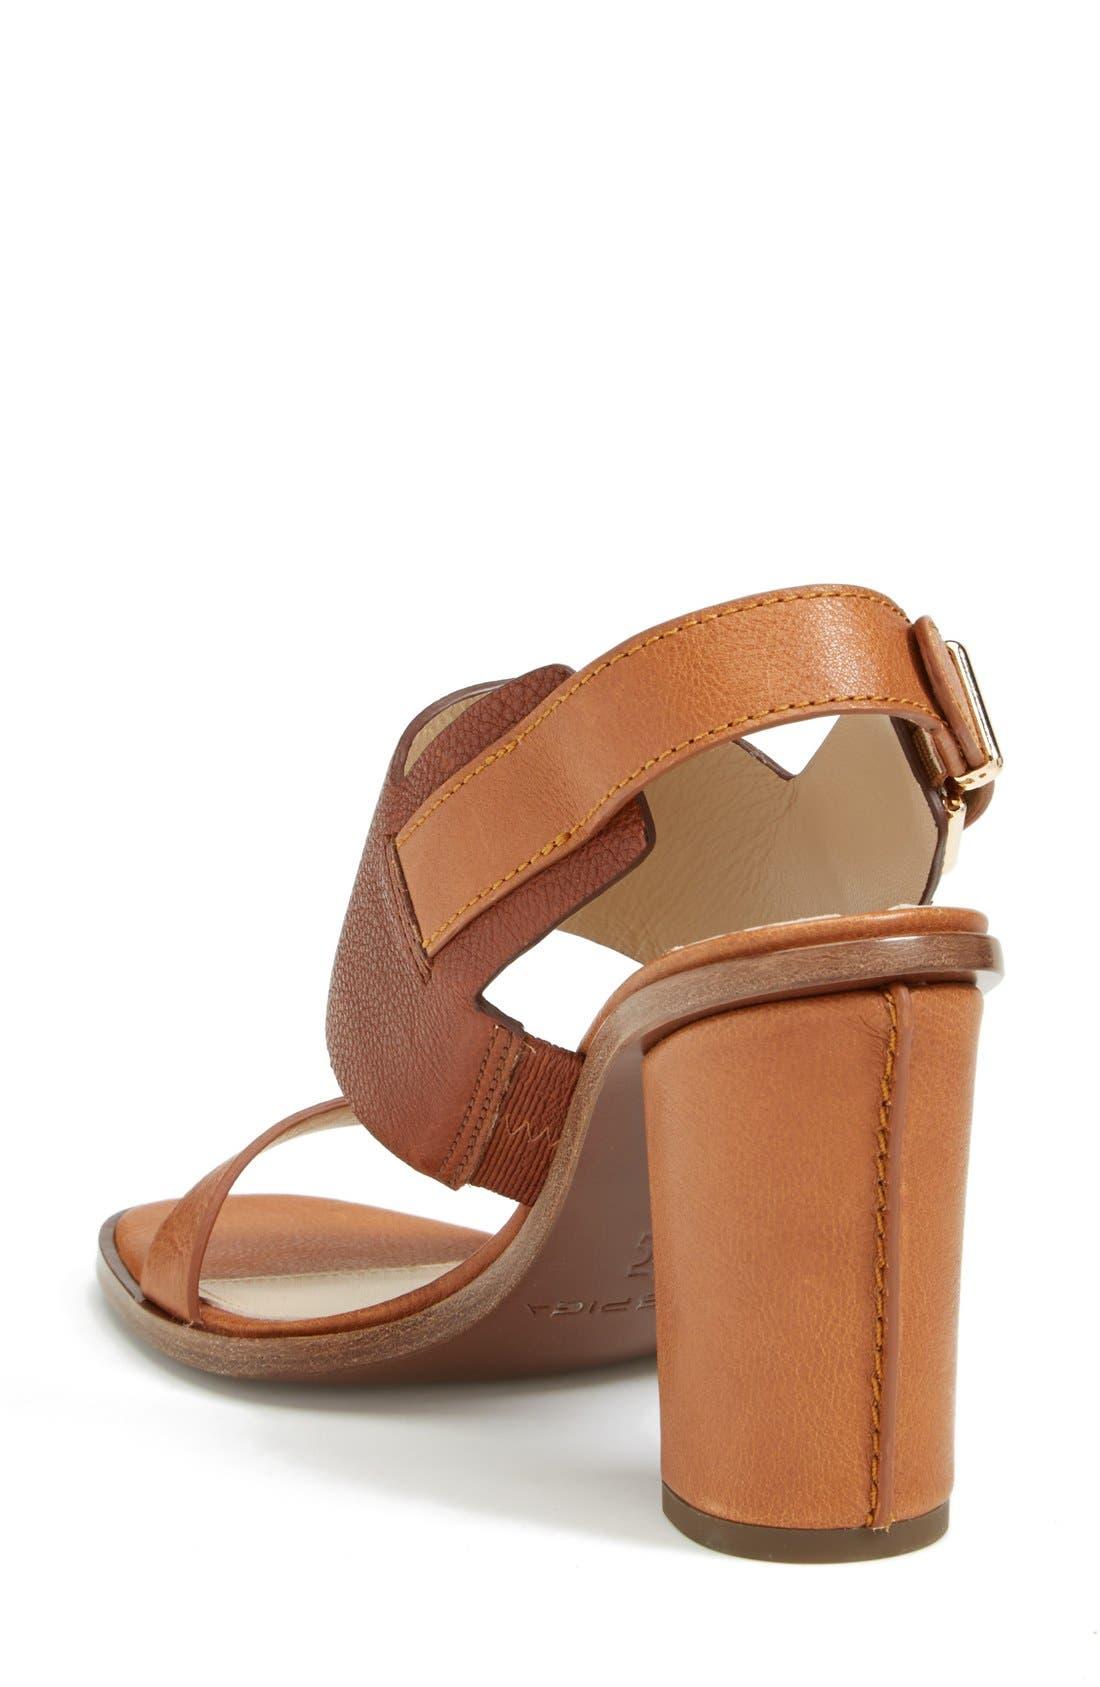 Alternate Image 2  - Via Spiga 'Baris' Leather Slingback Sandal (Women) (Nordstrom Exclusive)